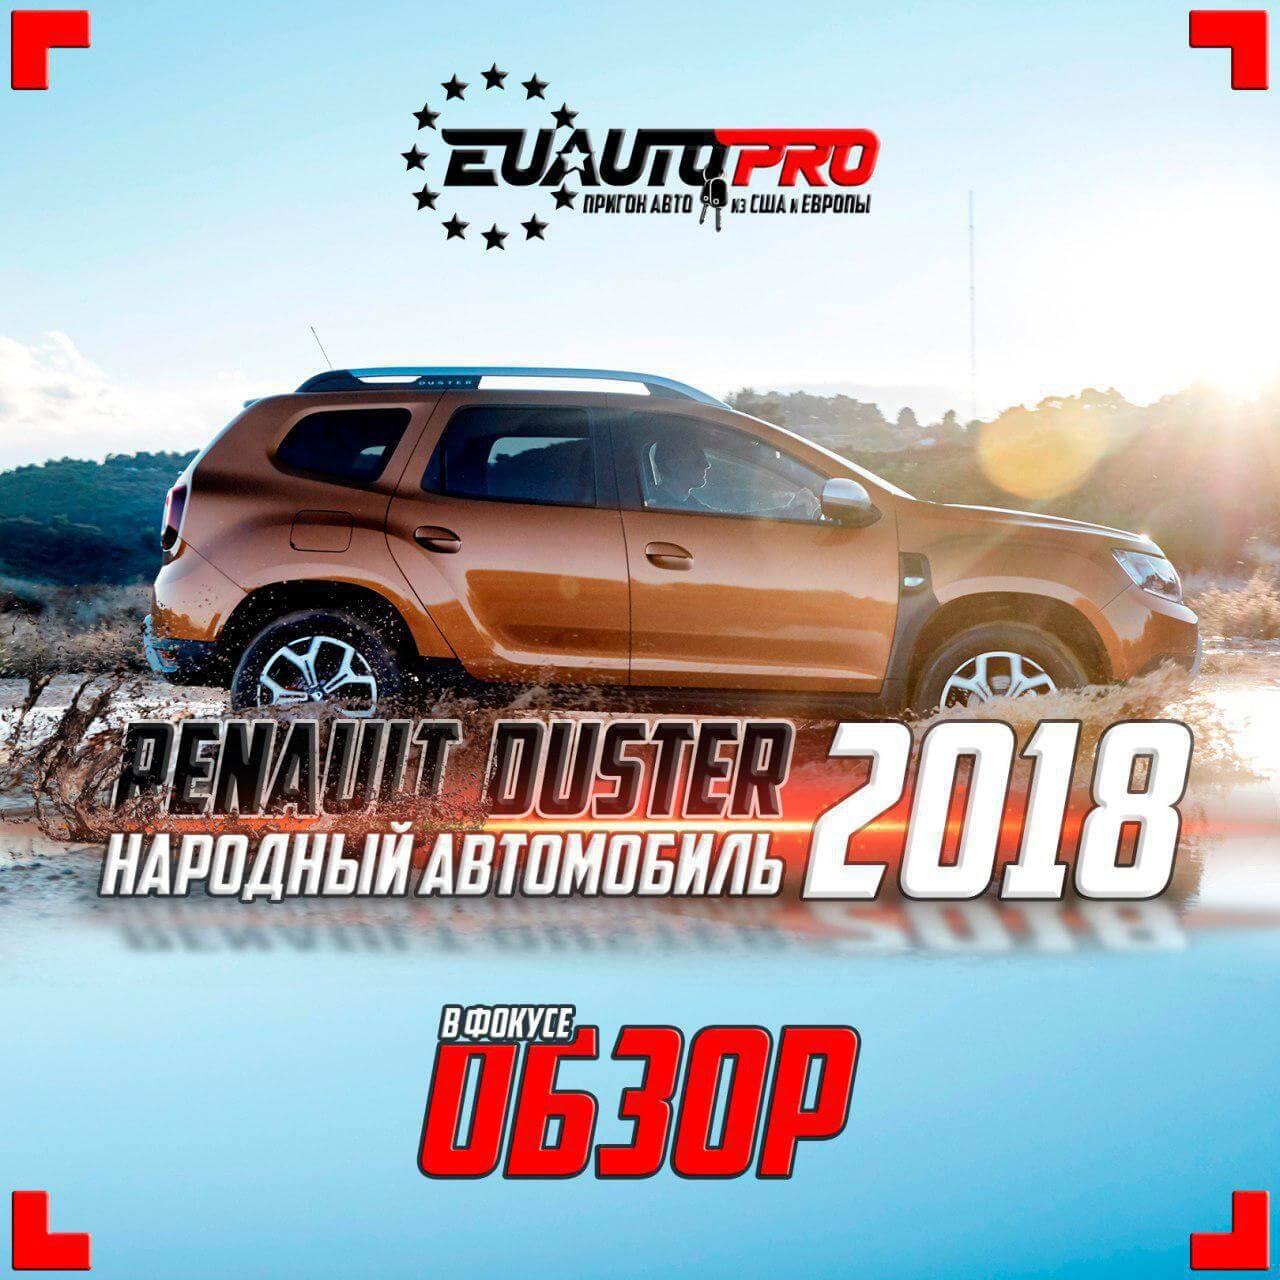 Renault-duster-2018-prigon-1